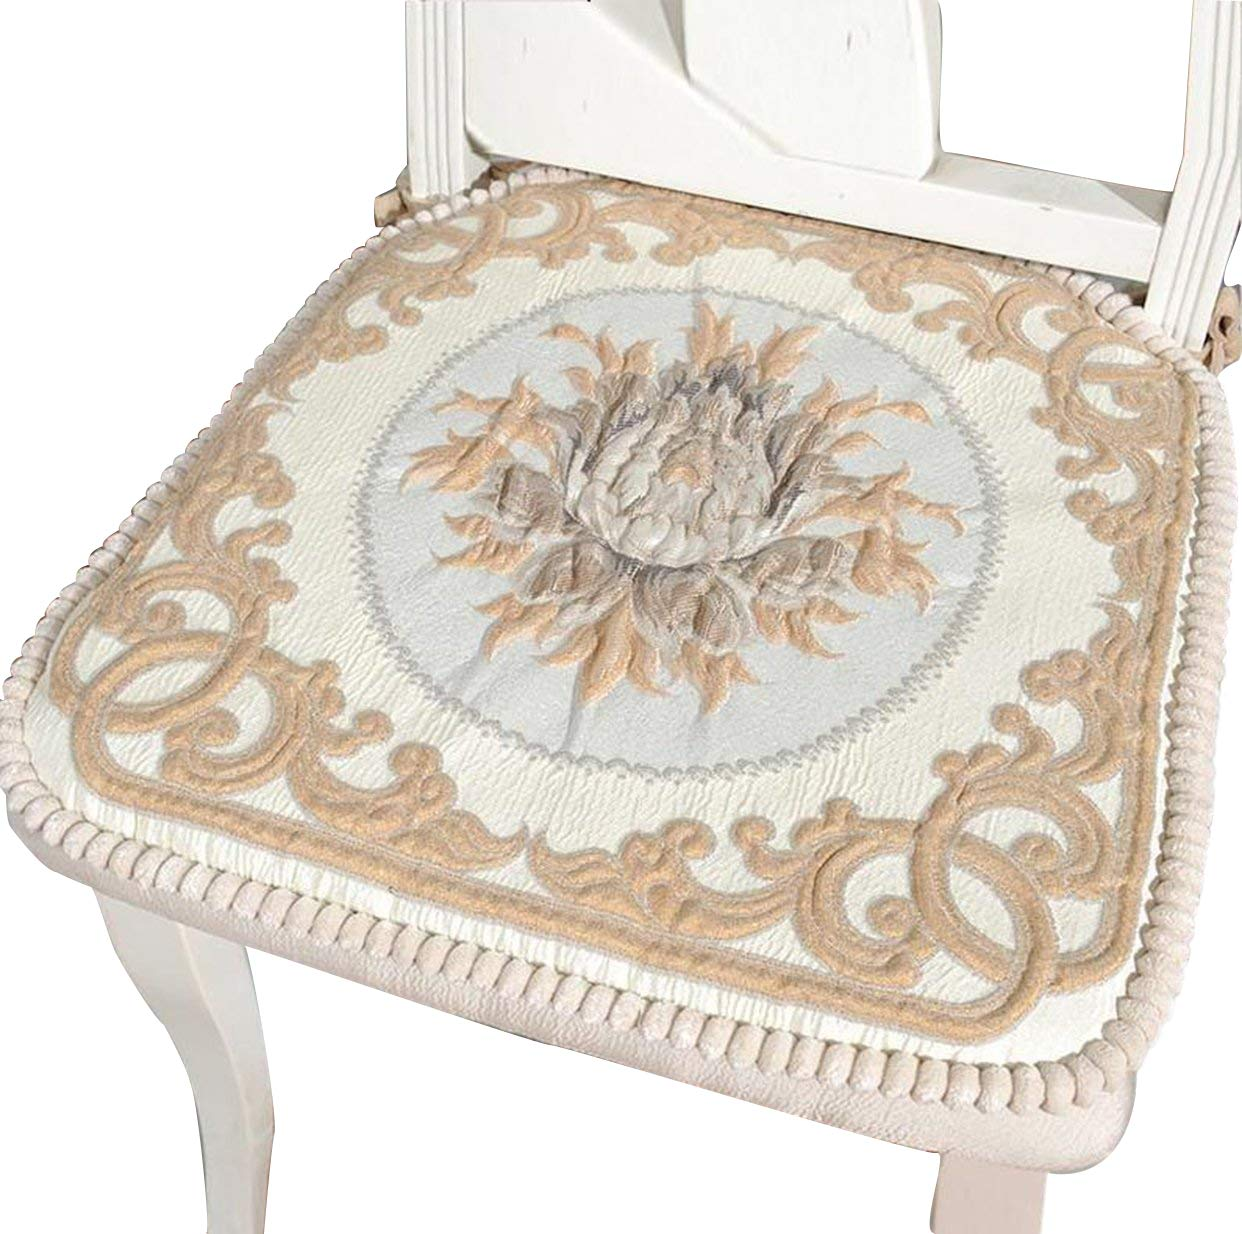 Sideli Foam Kitchen Chair Pads Non Slip 16